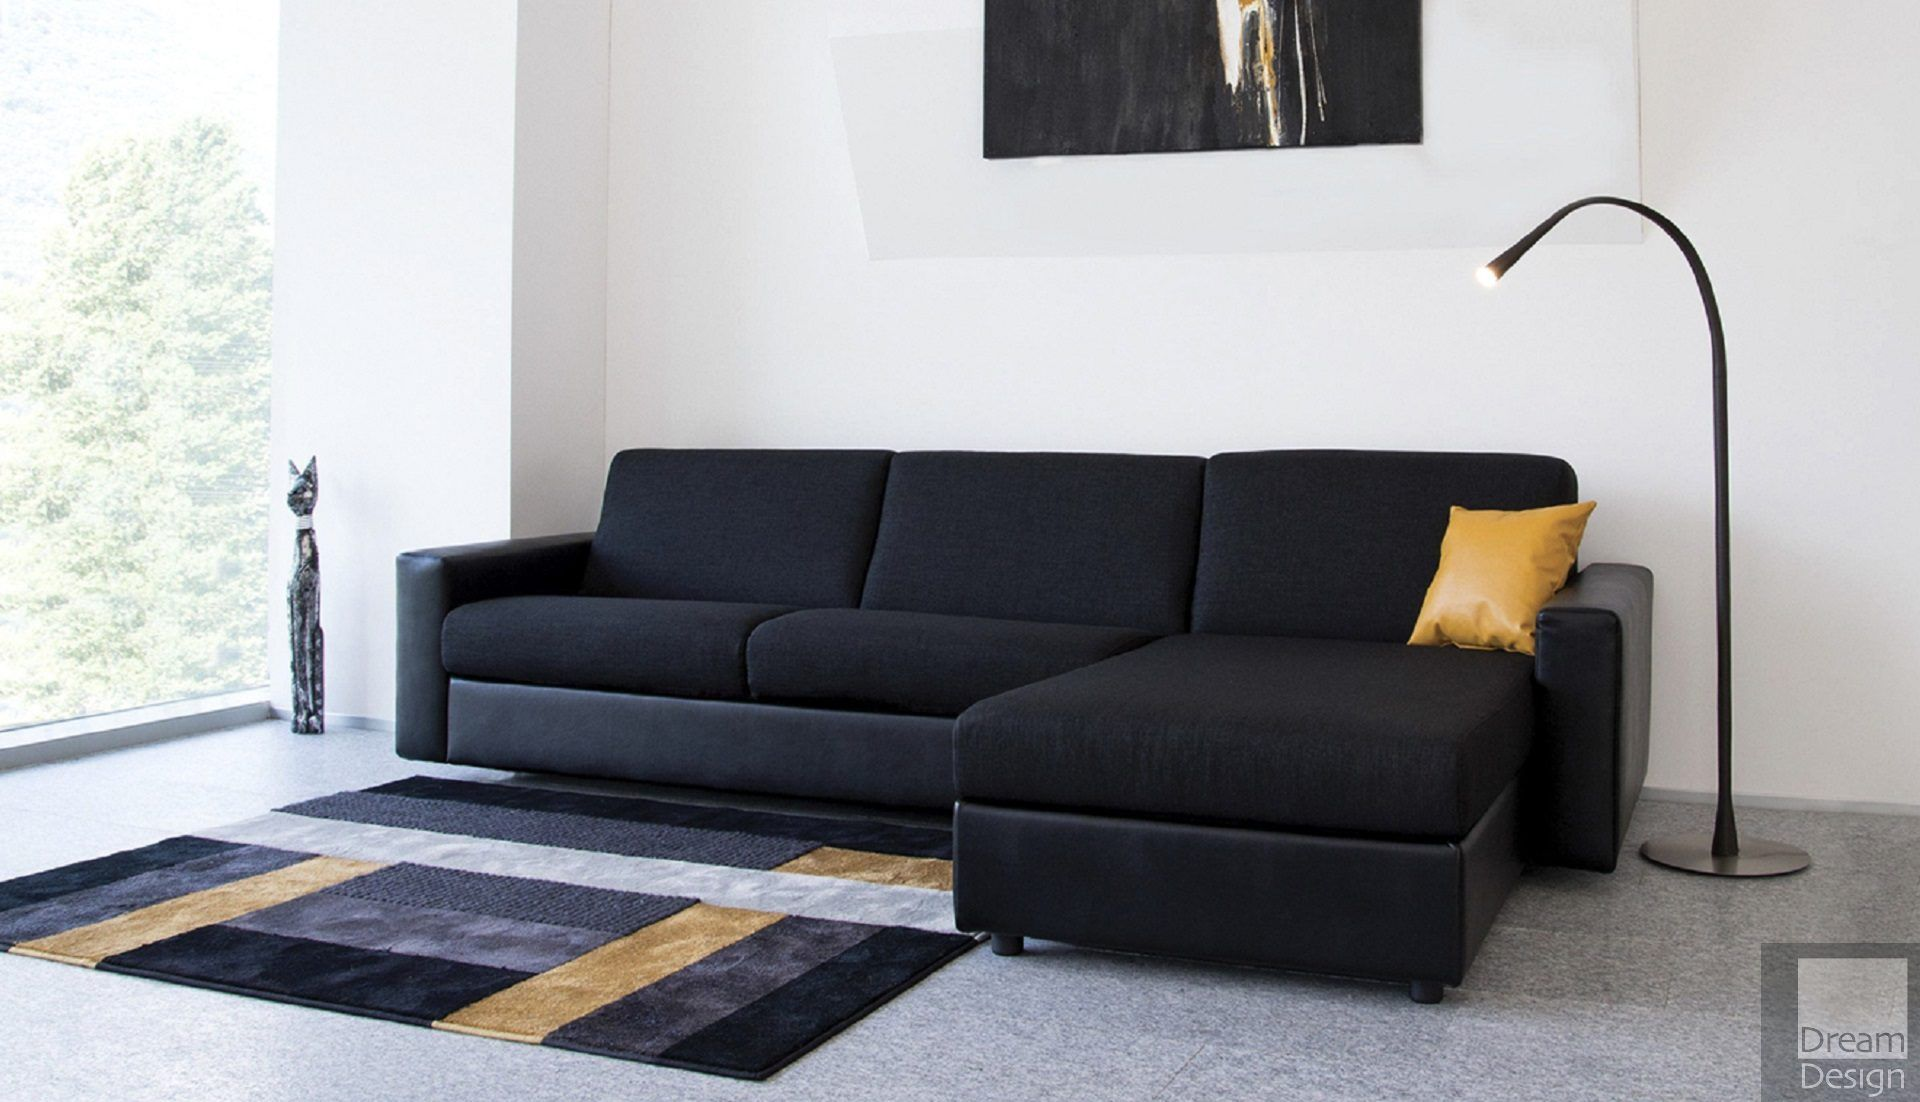 Contardi Flexiled Floor Lamp